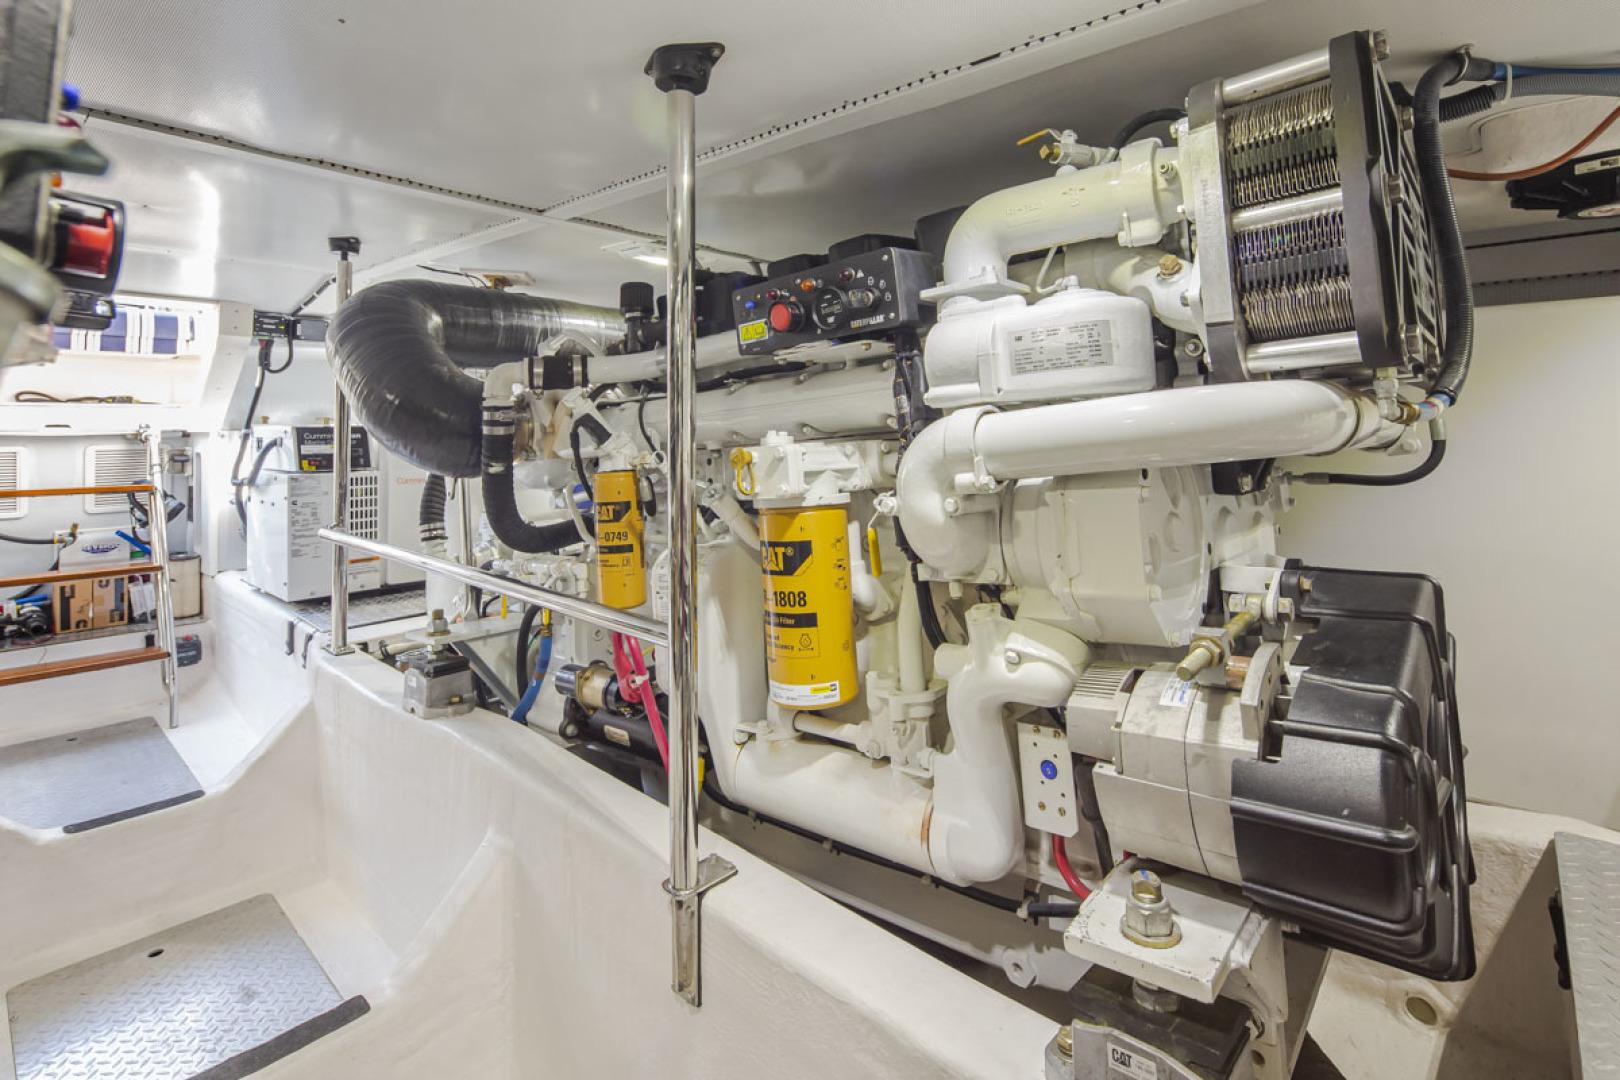 Sabre-Salon Express 2009-M&Ms Seattle-Washington-United States-Engine Room-1618478 | Thumbnail